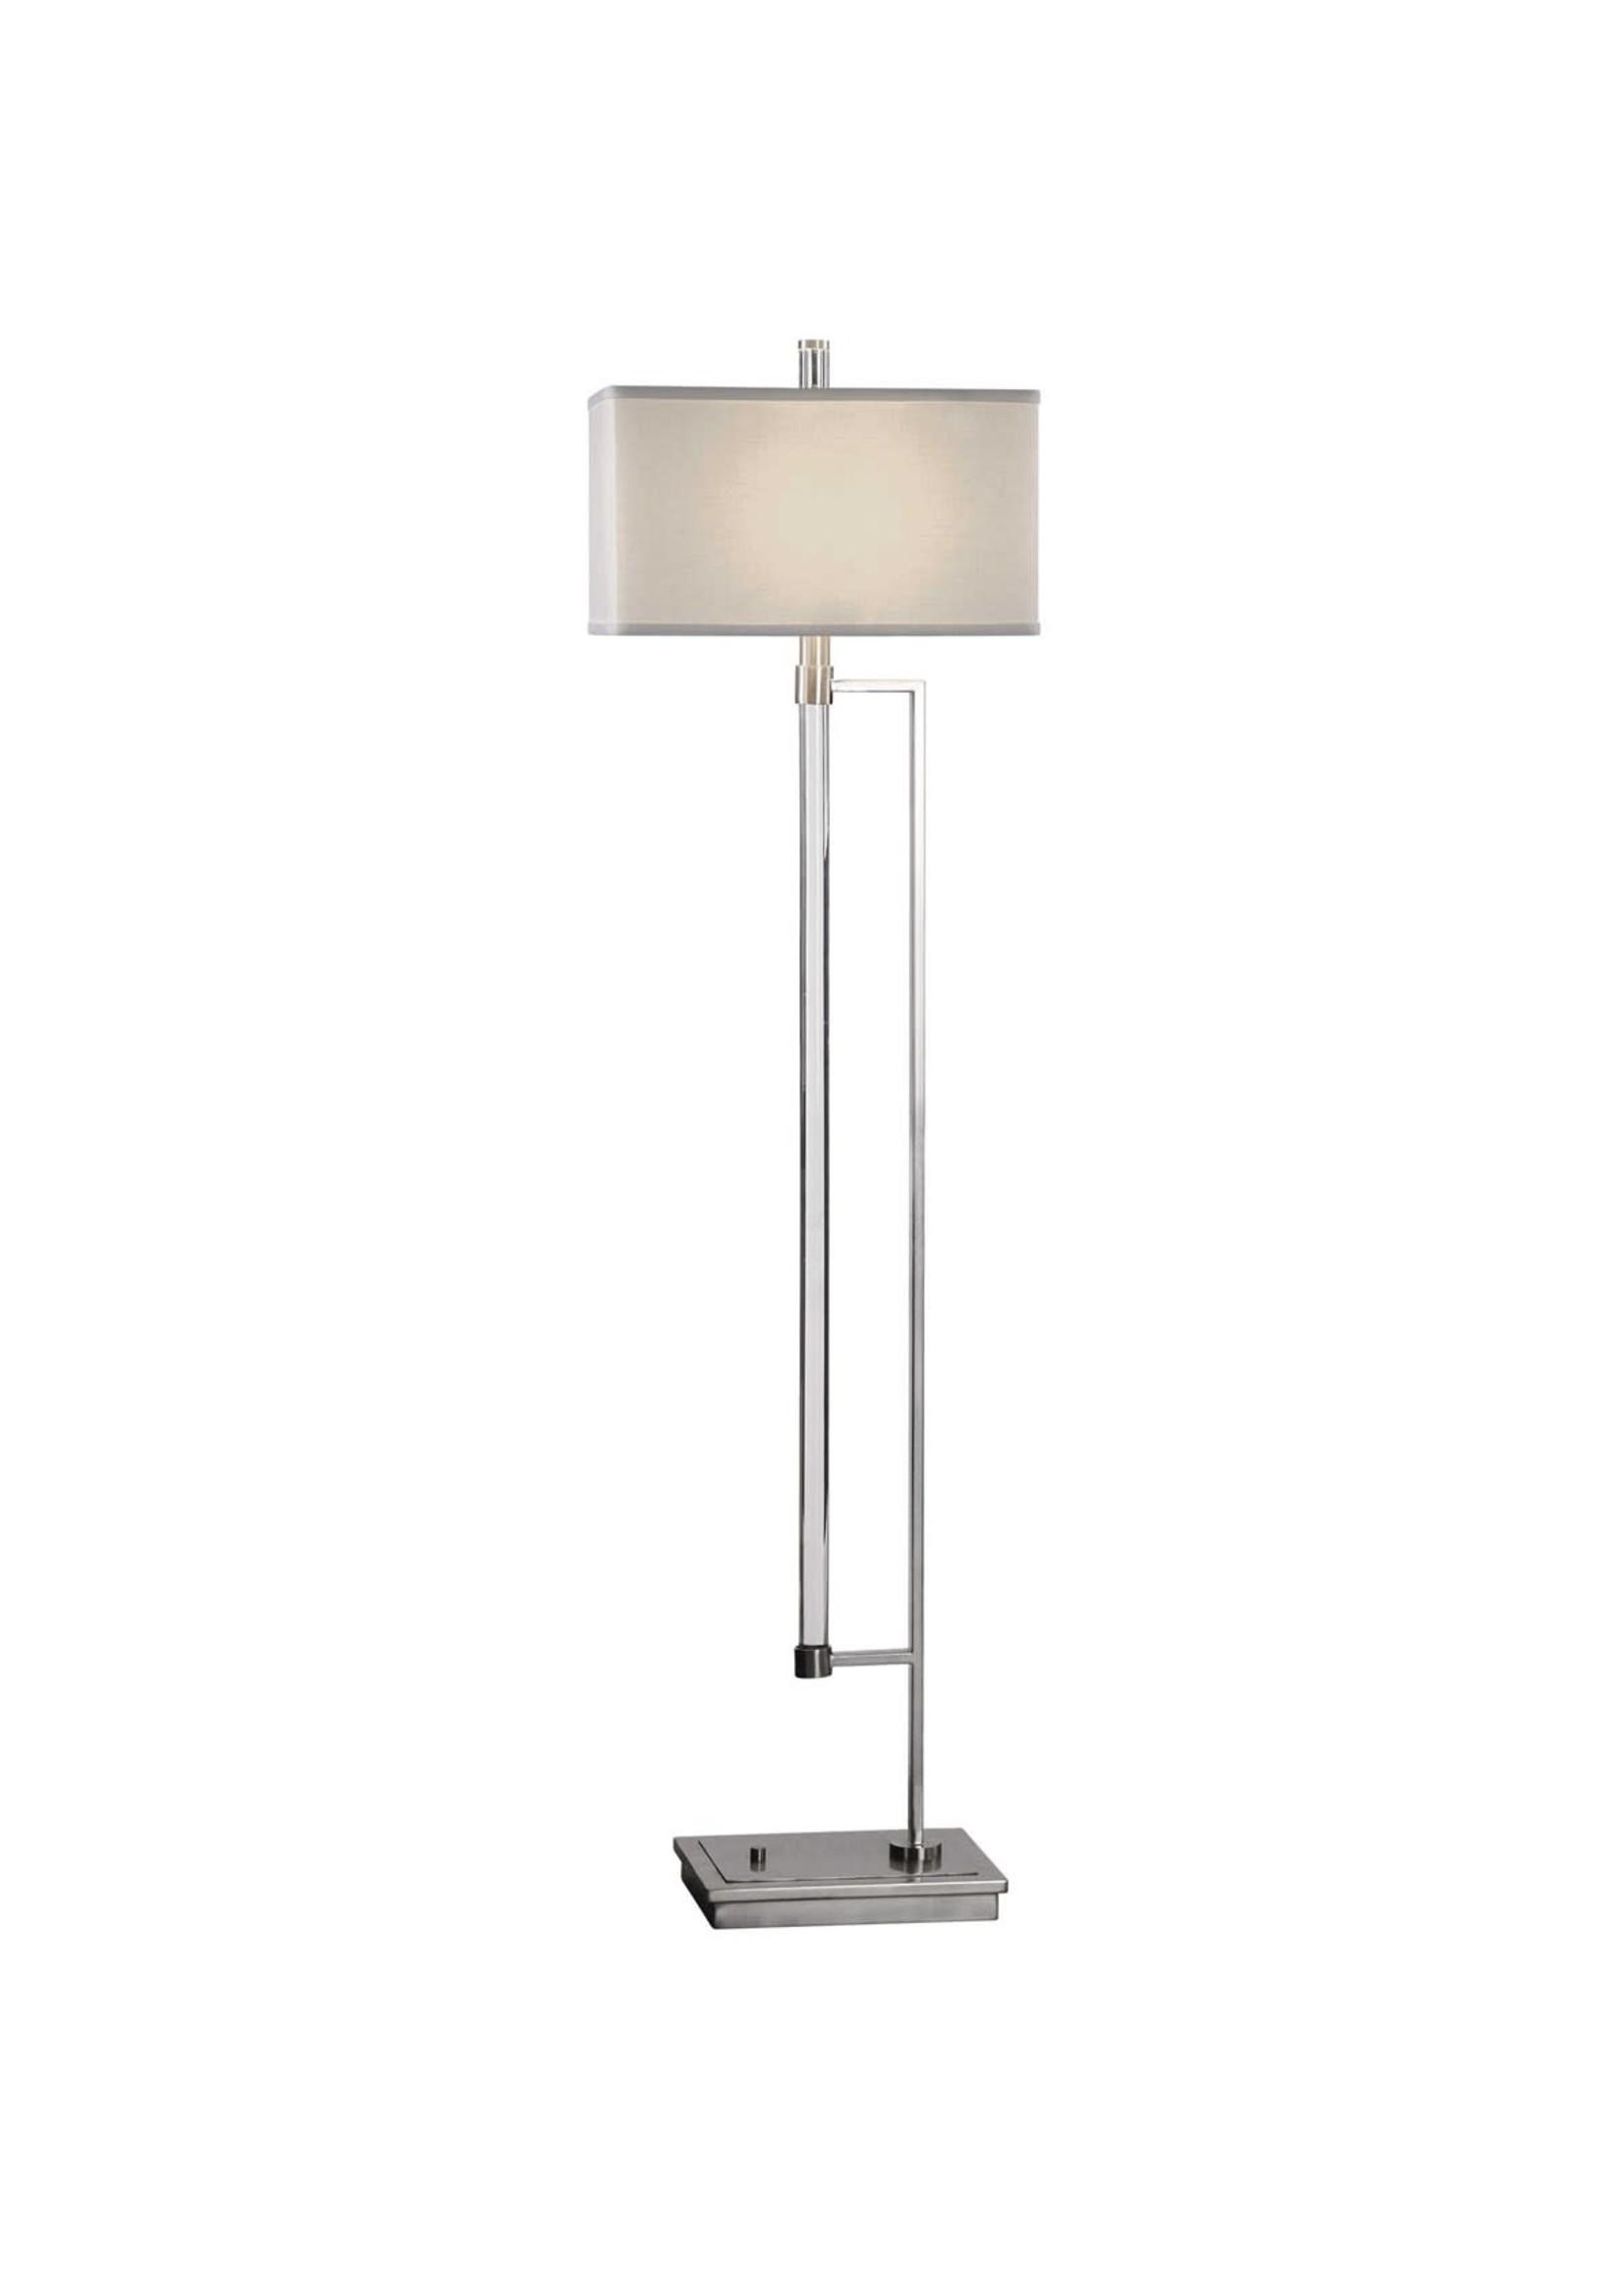 MANNAN FLOOR LAMP